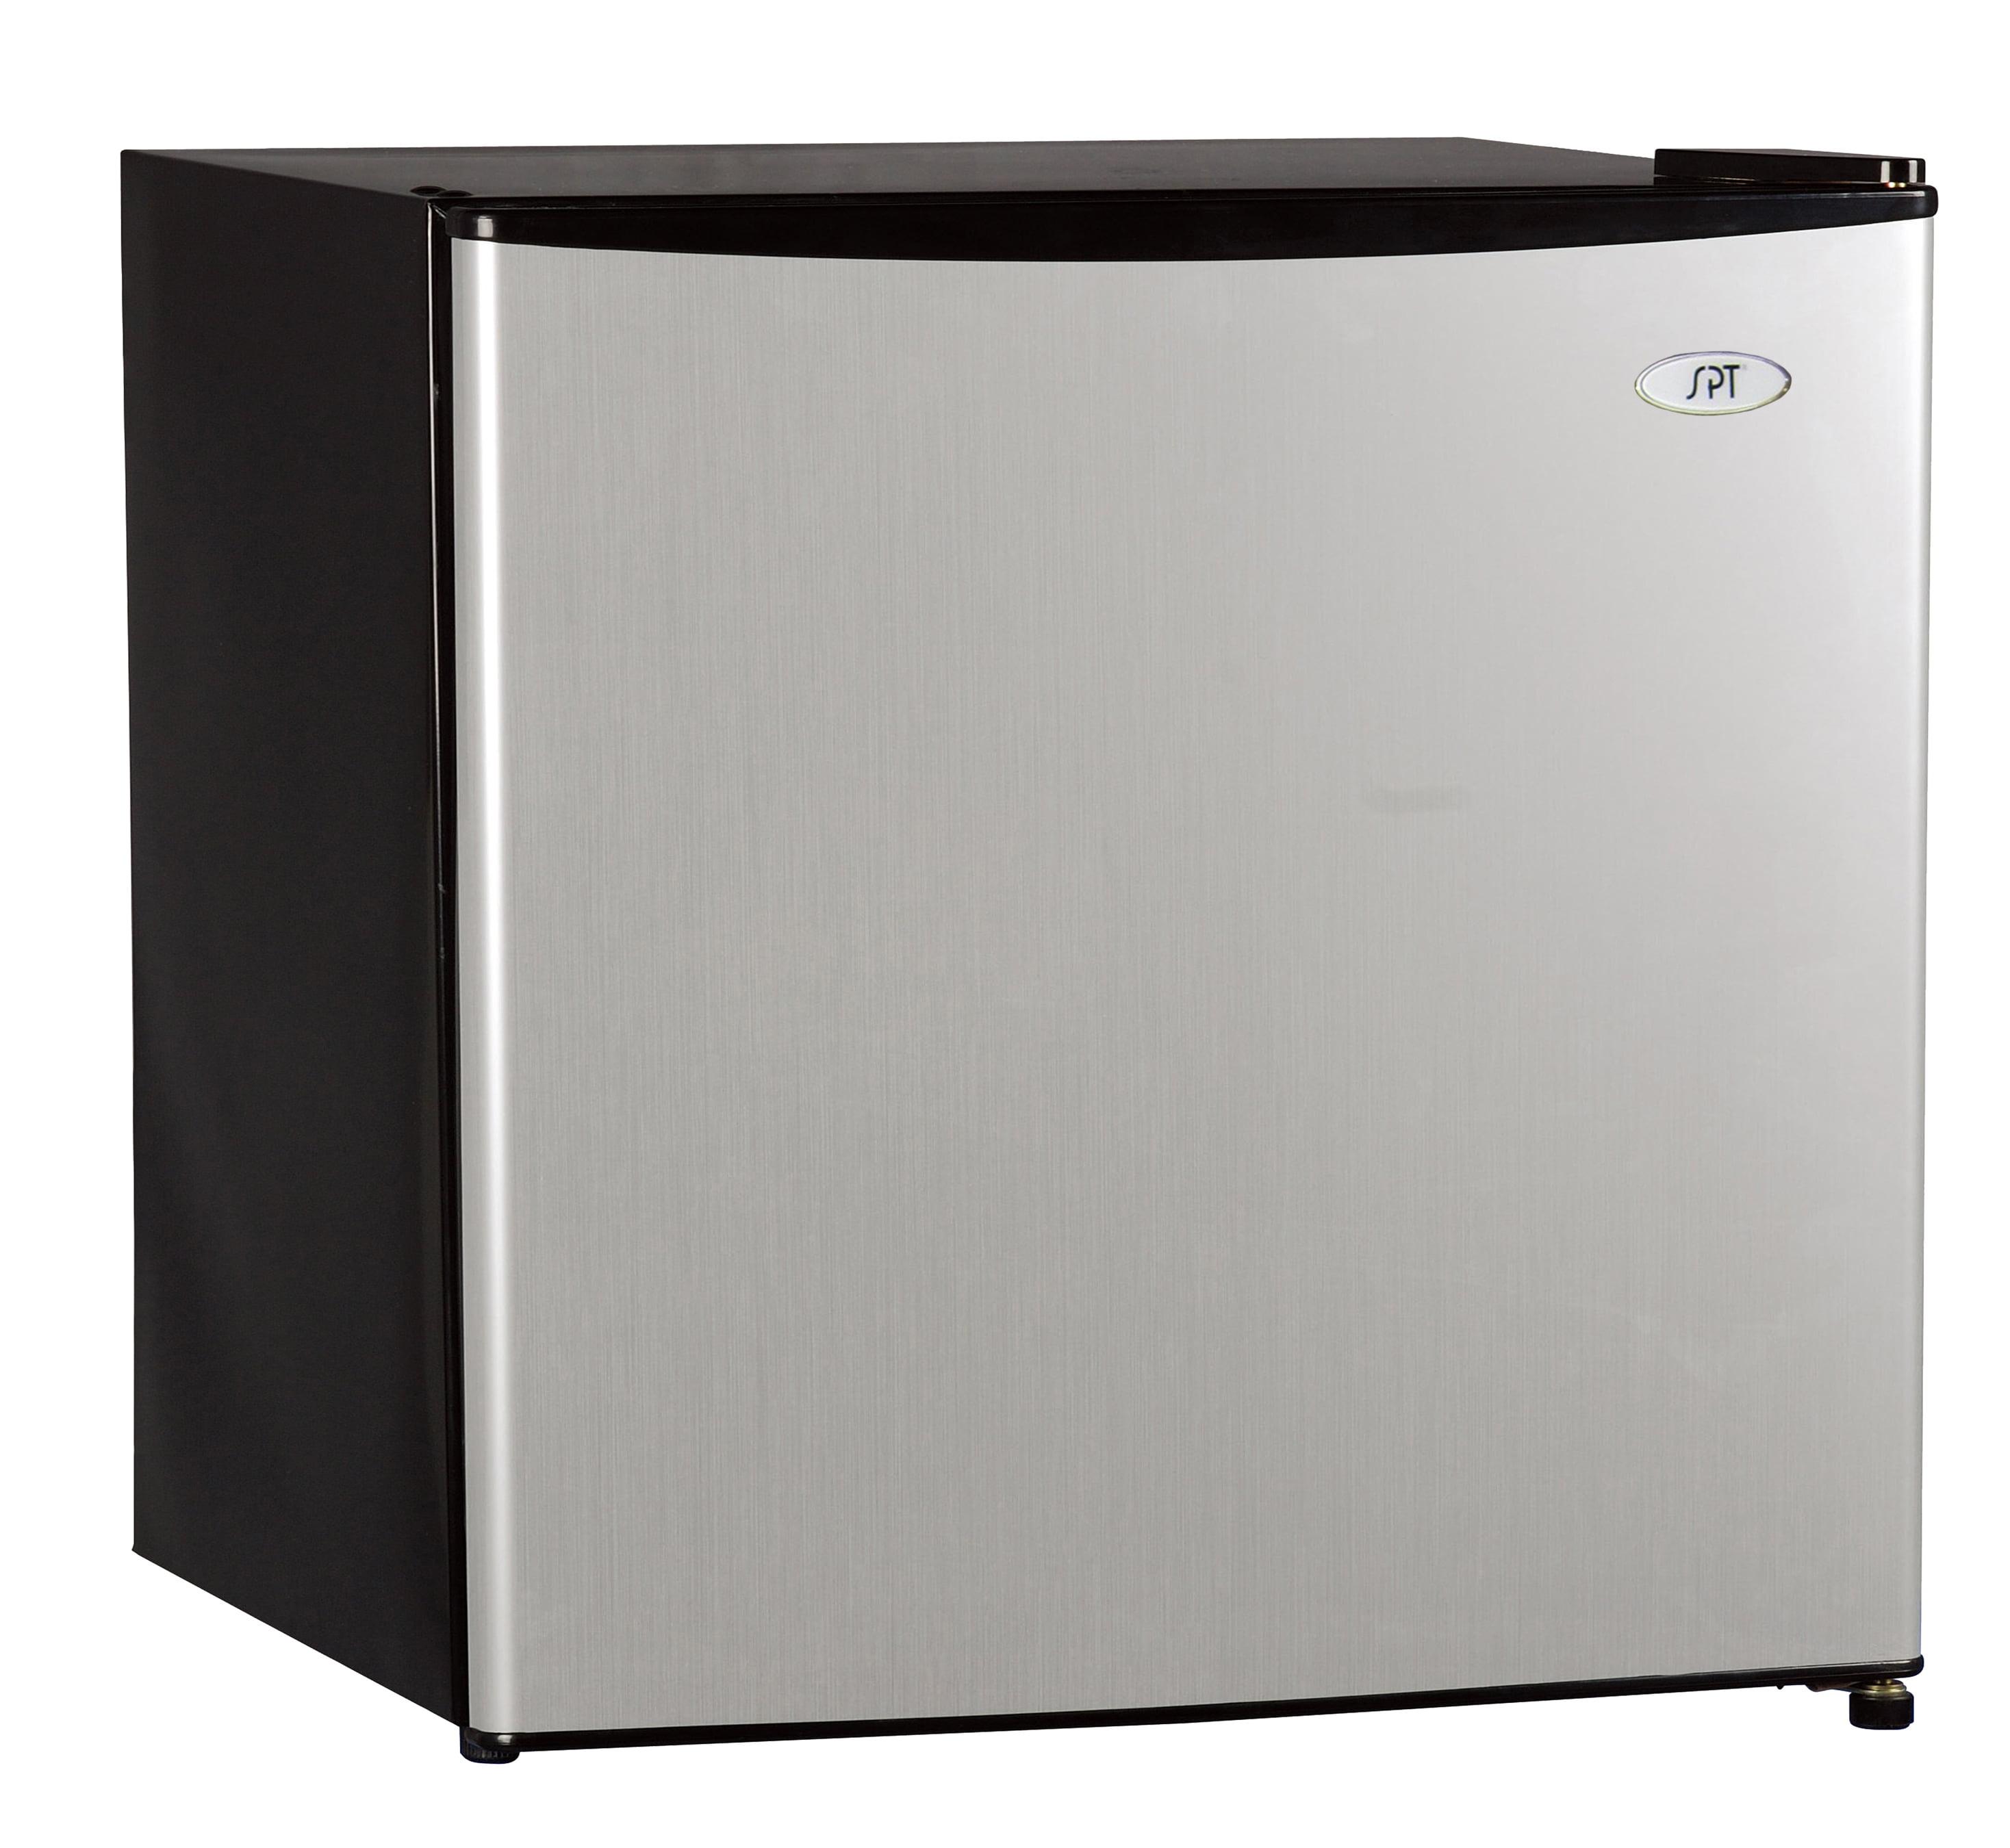 Sunpentown 1.6-cu. ft. Refrigerator, Stainless